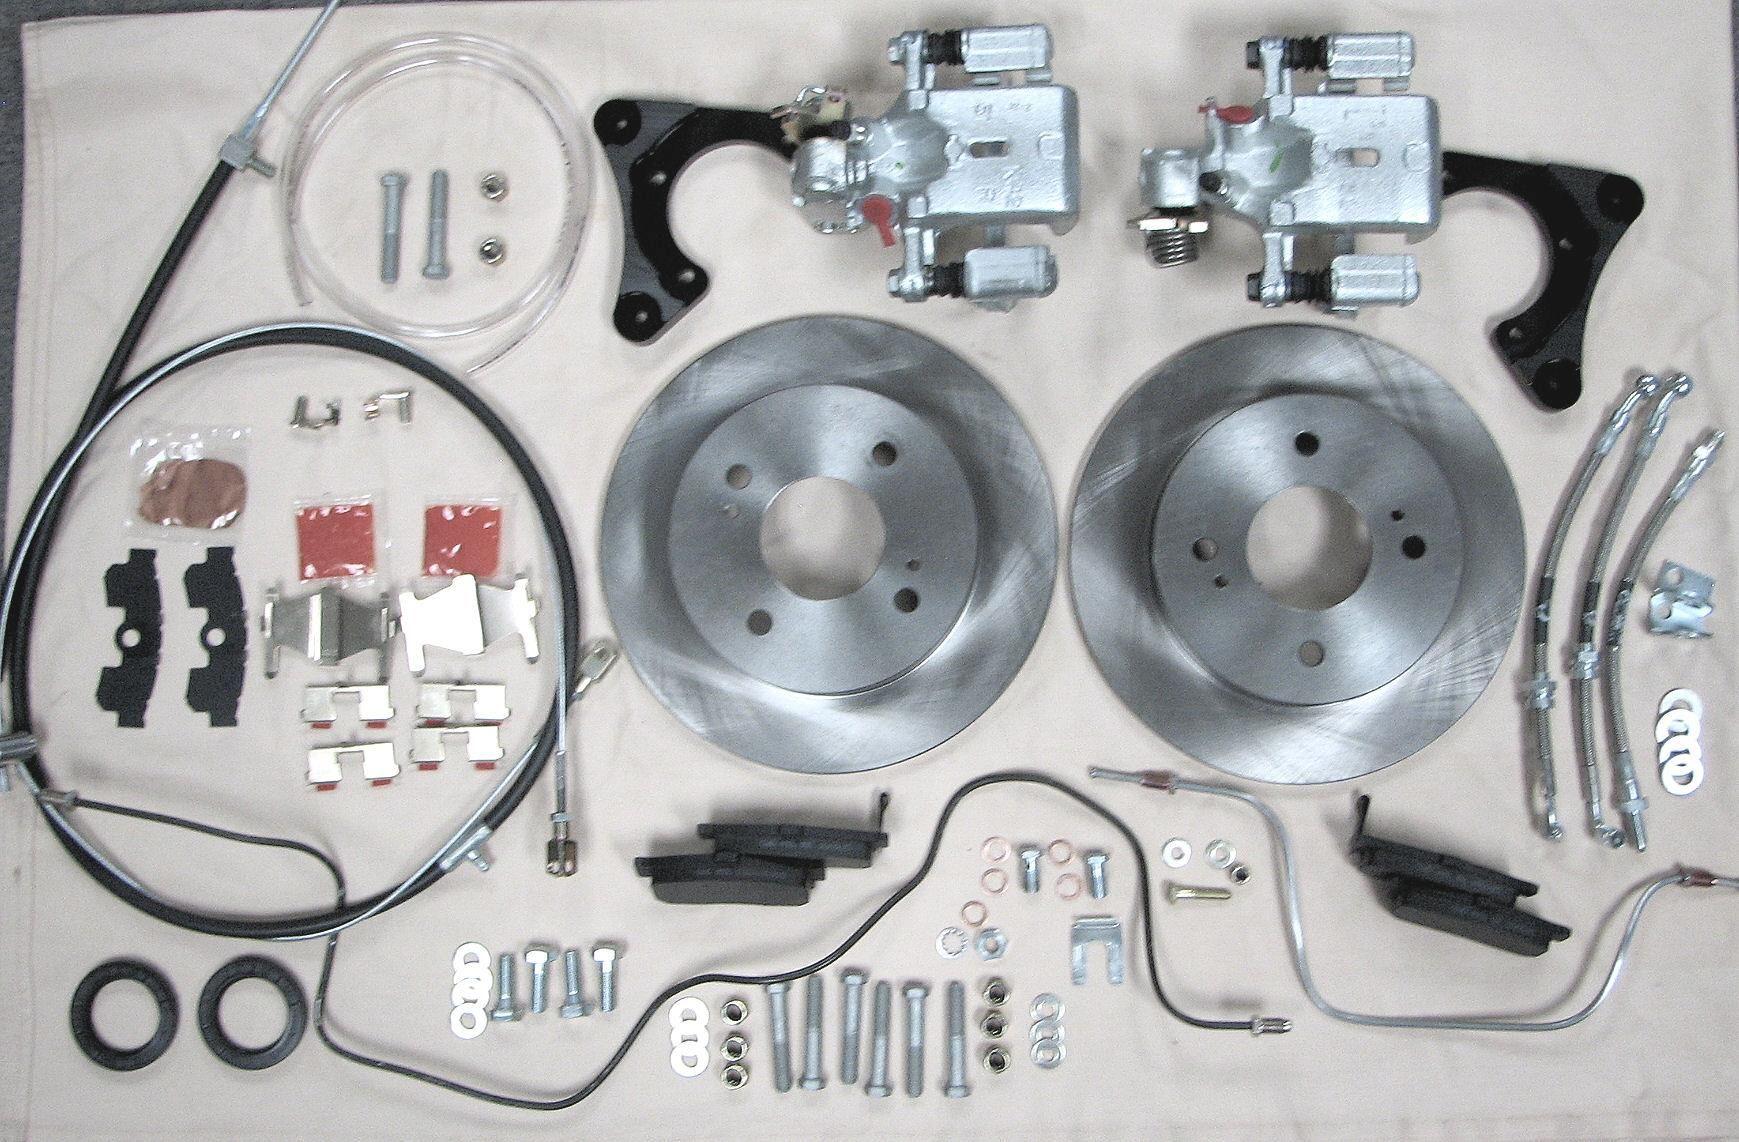 Mgb rear disc brake conversion kit